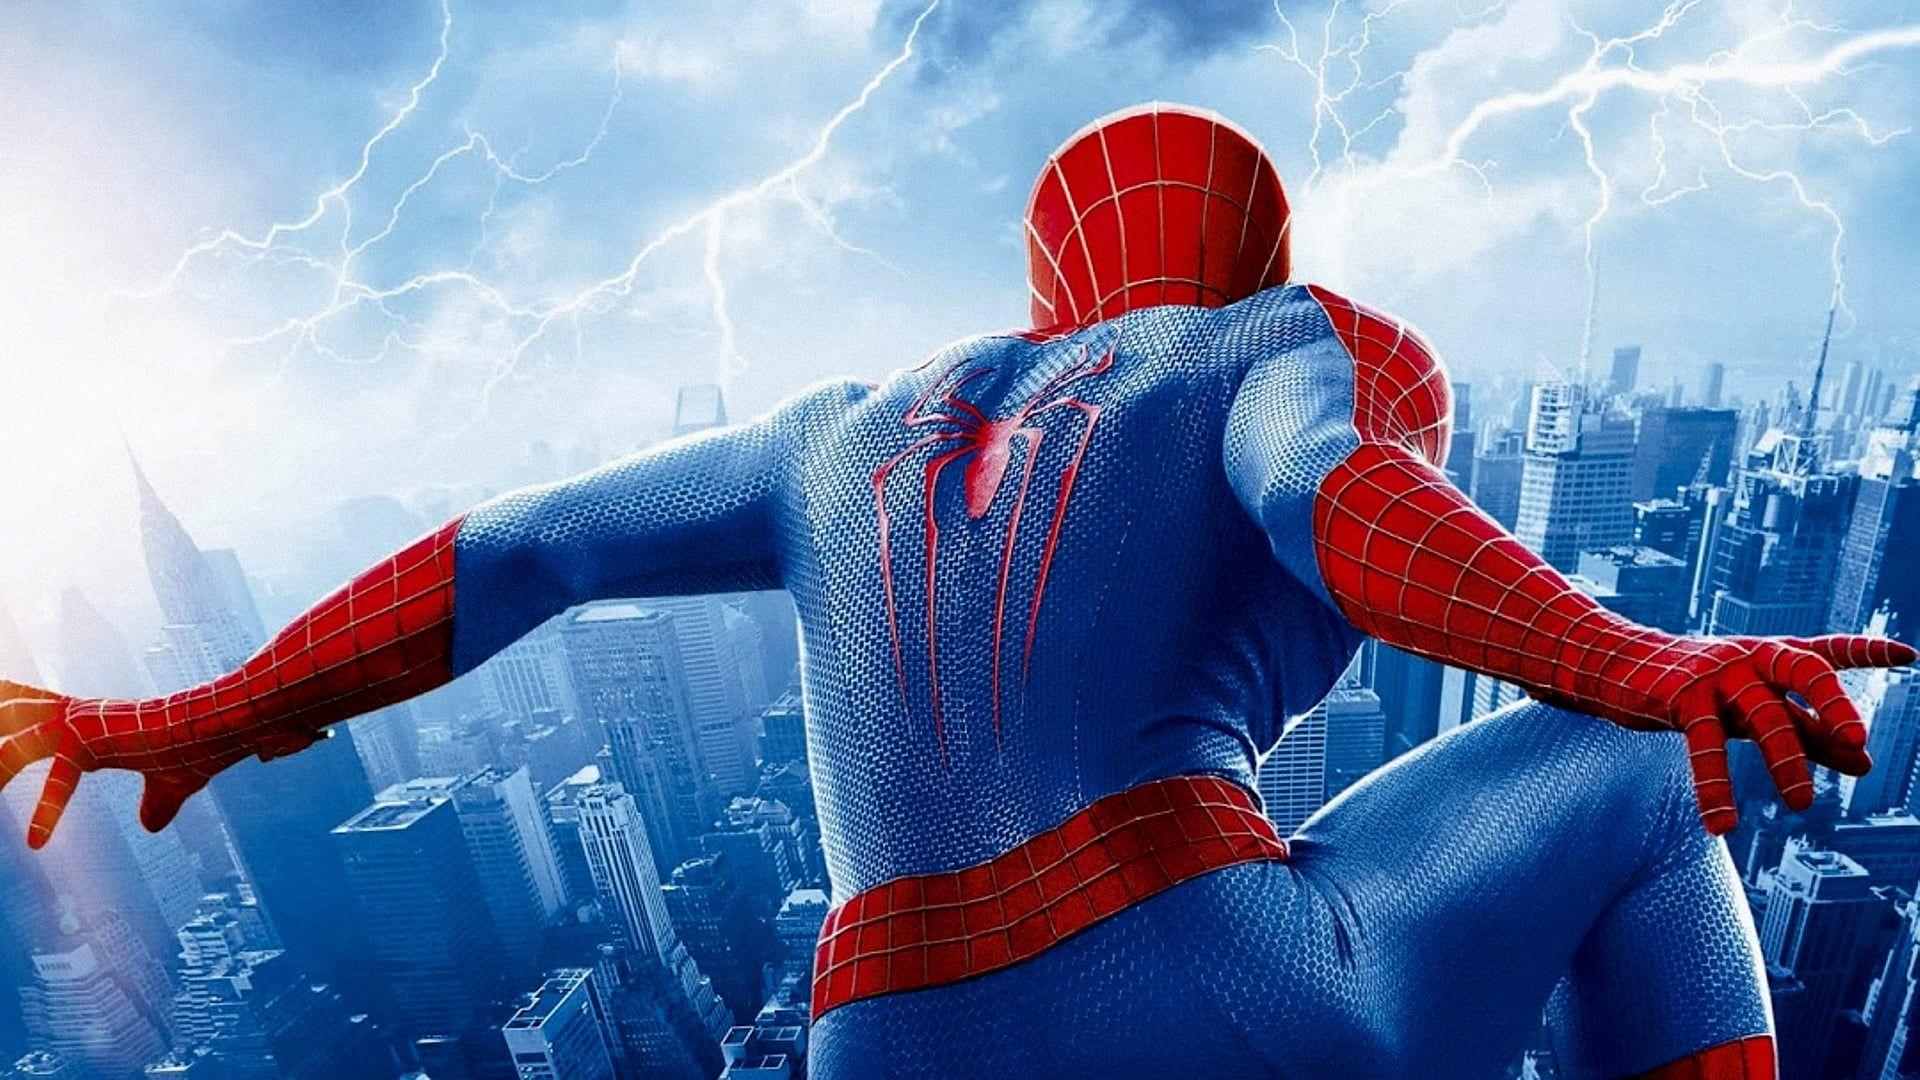 A Csodalatos Pokember 2 2014 Teljes Film Magyarul Online Hd Hu Mozi A Csodalatos Pokember 2 2014 Teljes Spiderman Amazing Spiderman The Amazing Spiderman 2